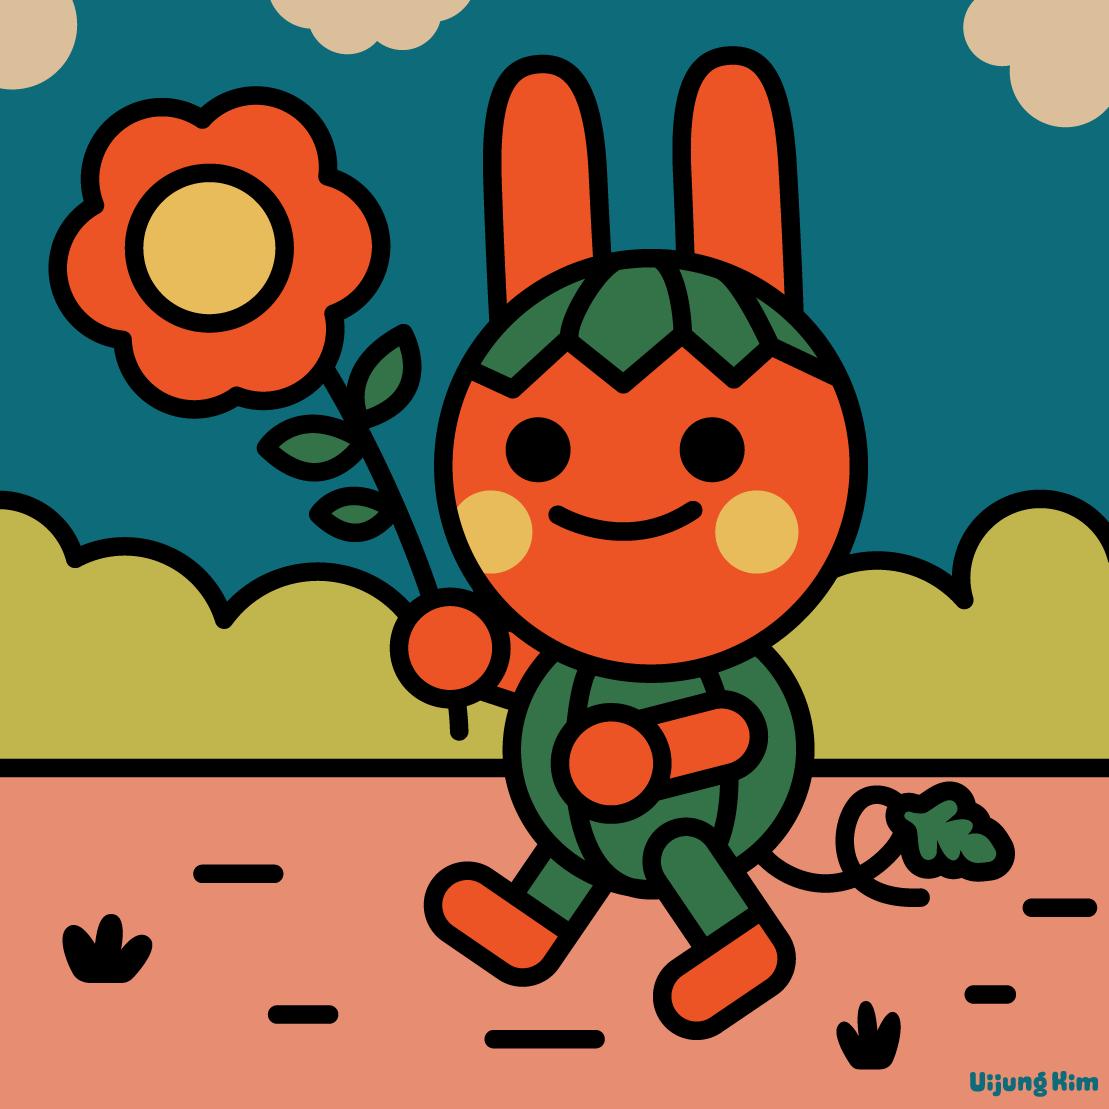 watermelonrabbit_UijungKim_2.png